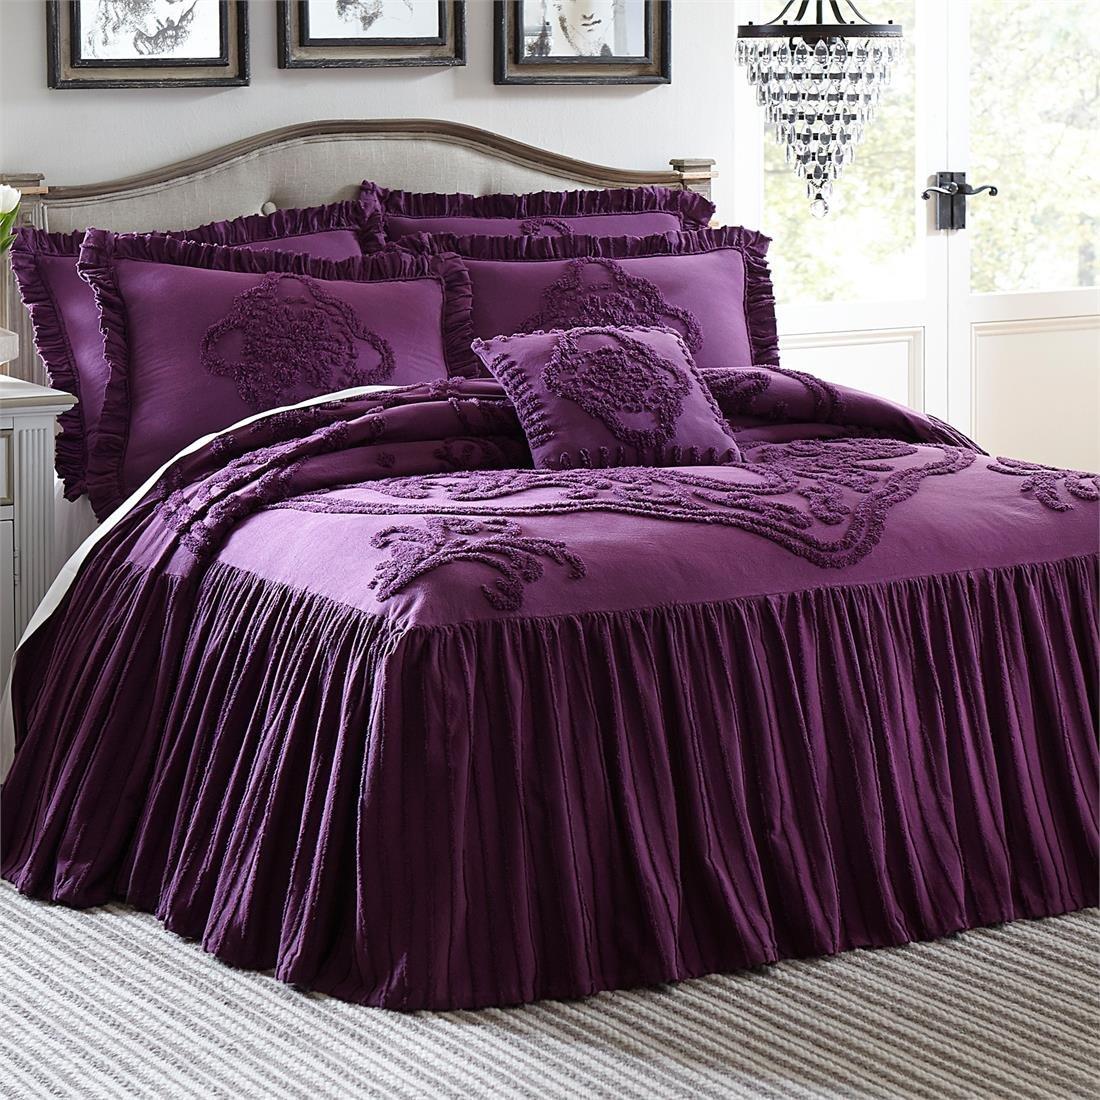 Amazoncom Brylanehome Madison Flounce Bedspread EggplantQueen